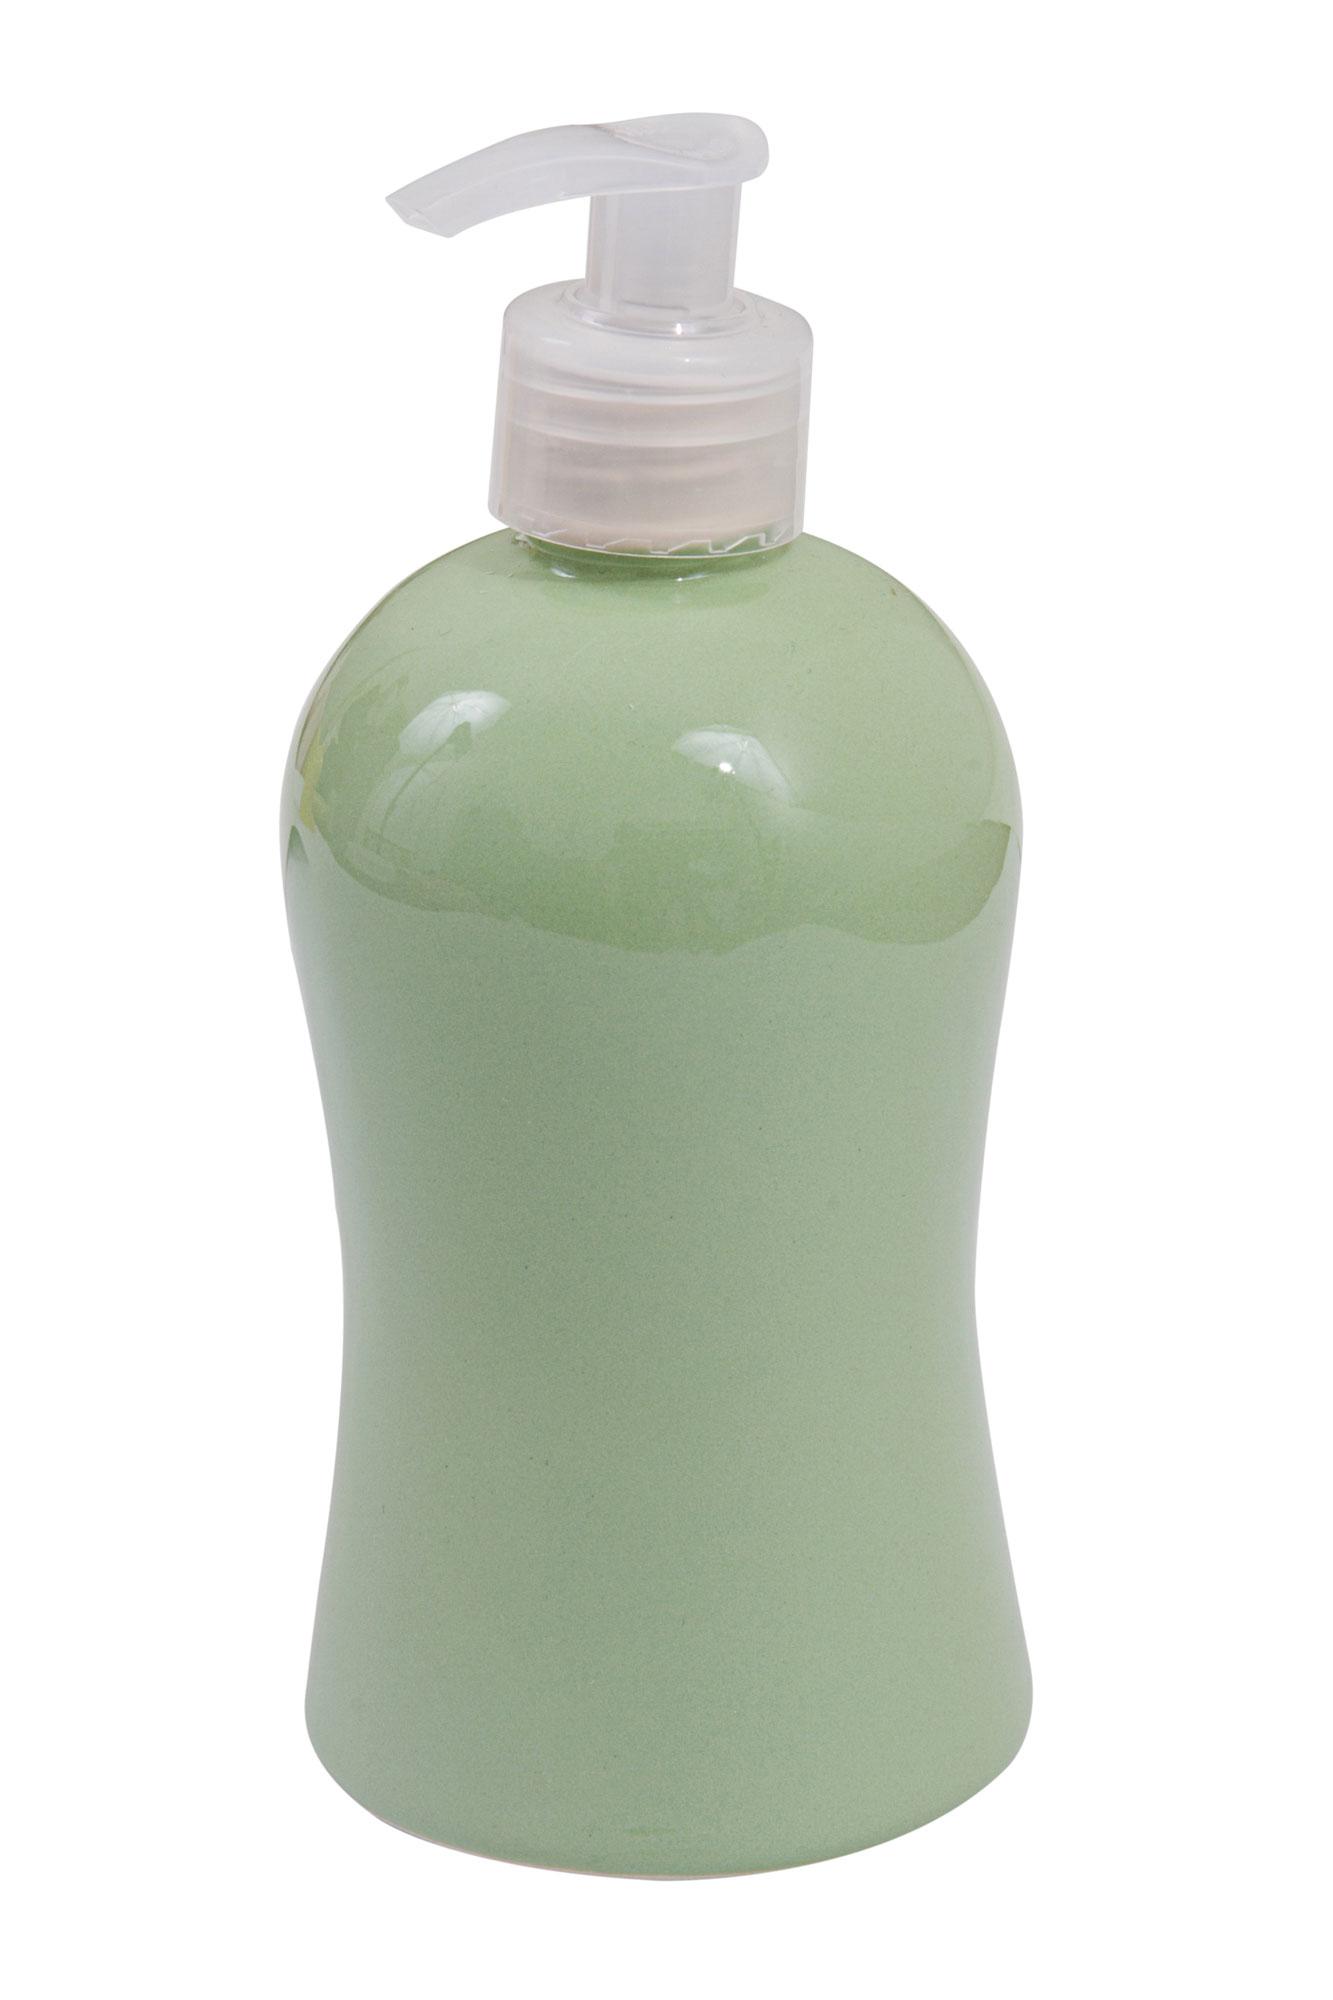 Porta sabonete líquido / álcool gel verde